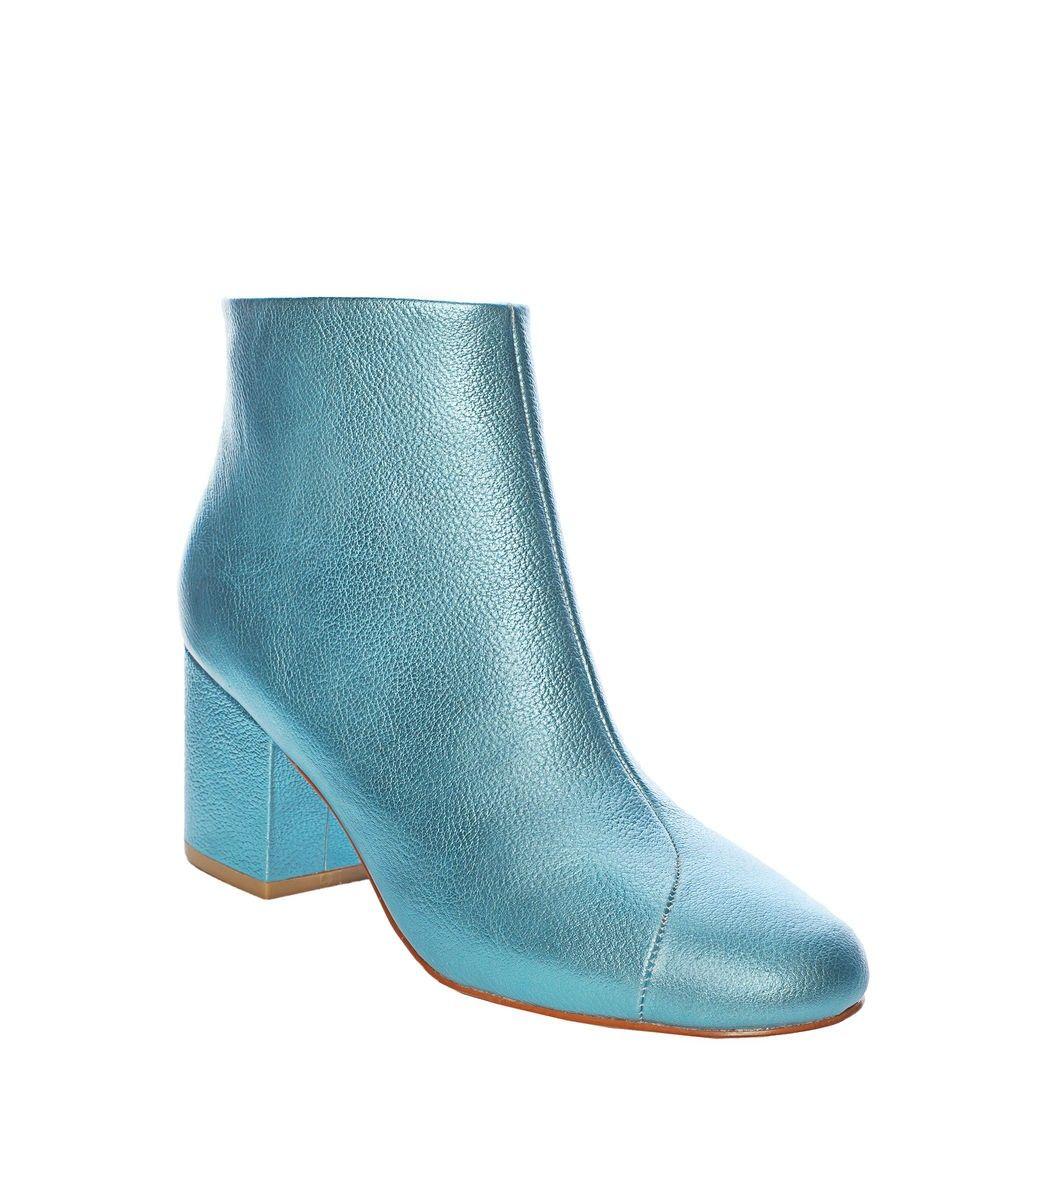 64112d040b70 Gorman Online    High Tide Boot - Spring 15 - Clothing